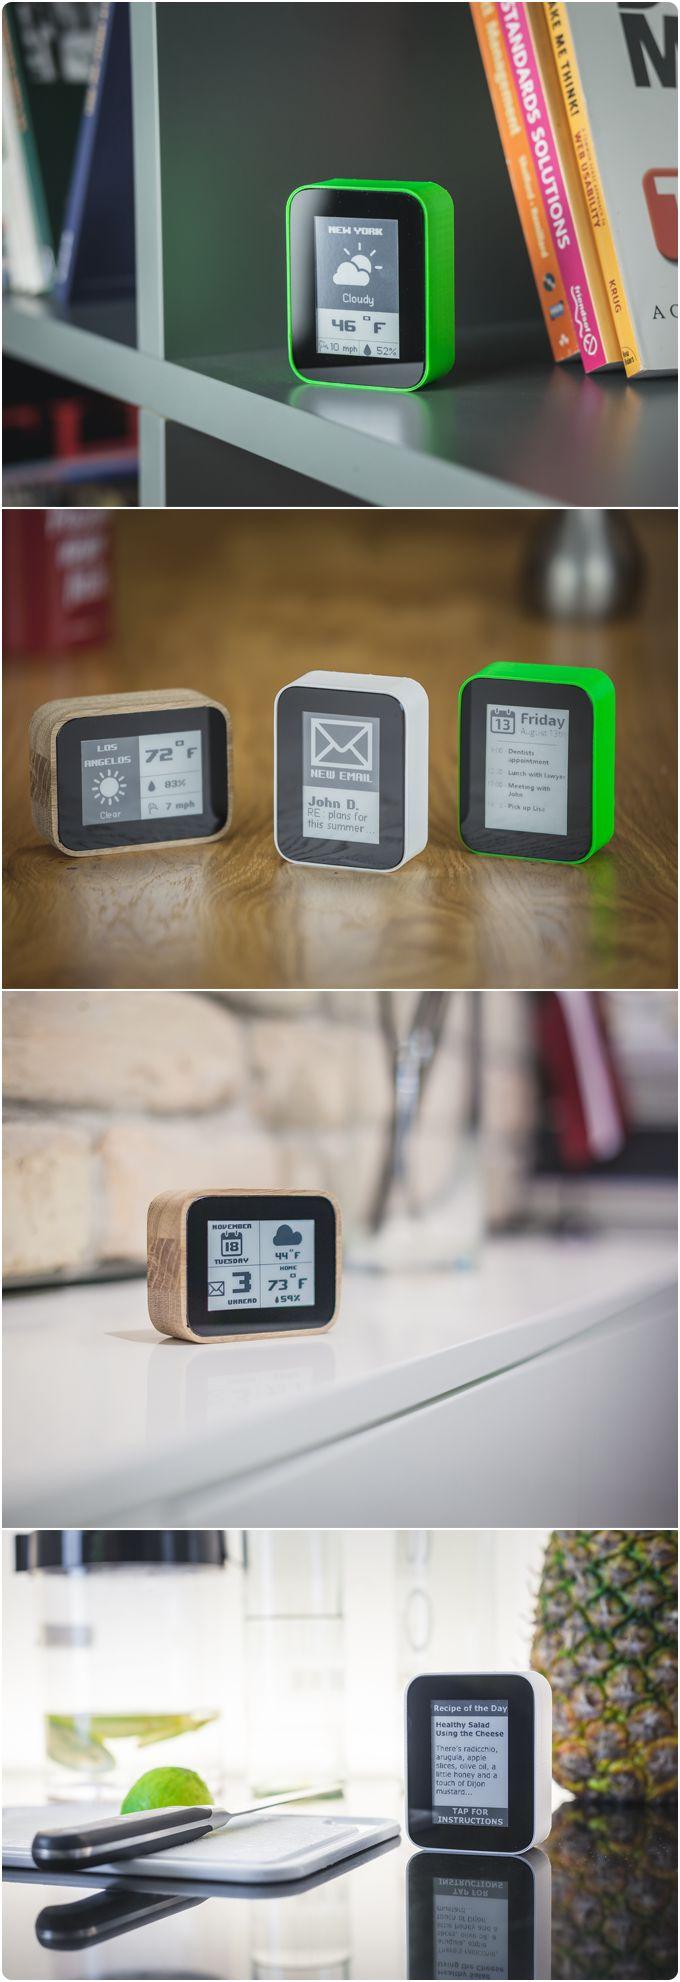 DISPLIO - WiFi display that tracks what's important to you by Draugiem Group — Kickstarter